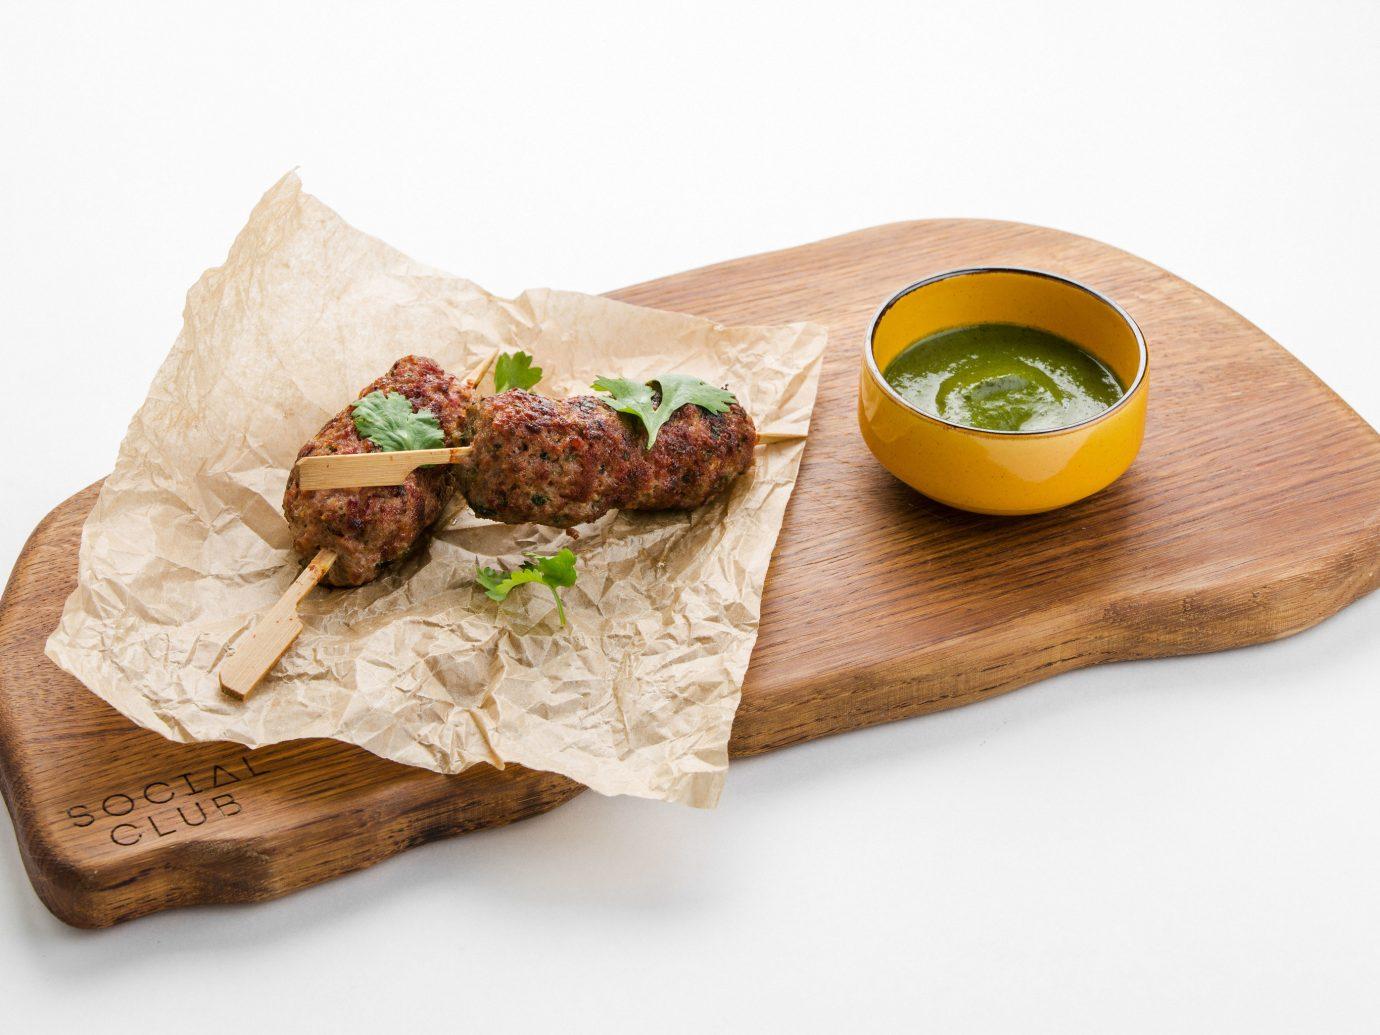 Arts + Culture Hotels Jetsetter Guides food dish tableware cuisine platter cut bread recipe vegetarian food slice sliced snack food